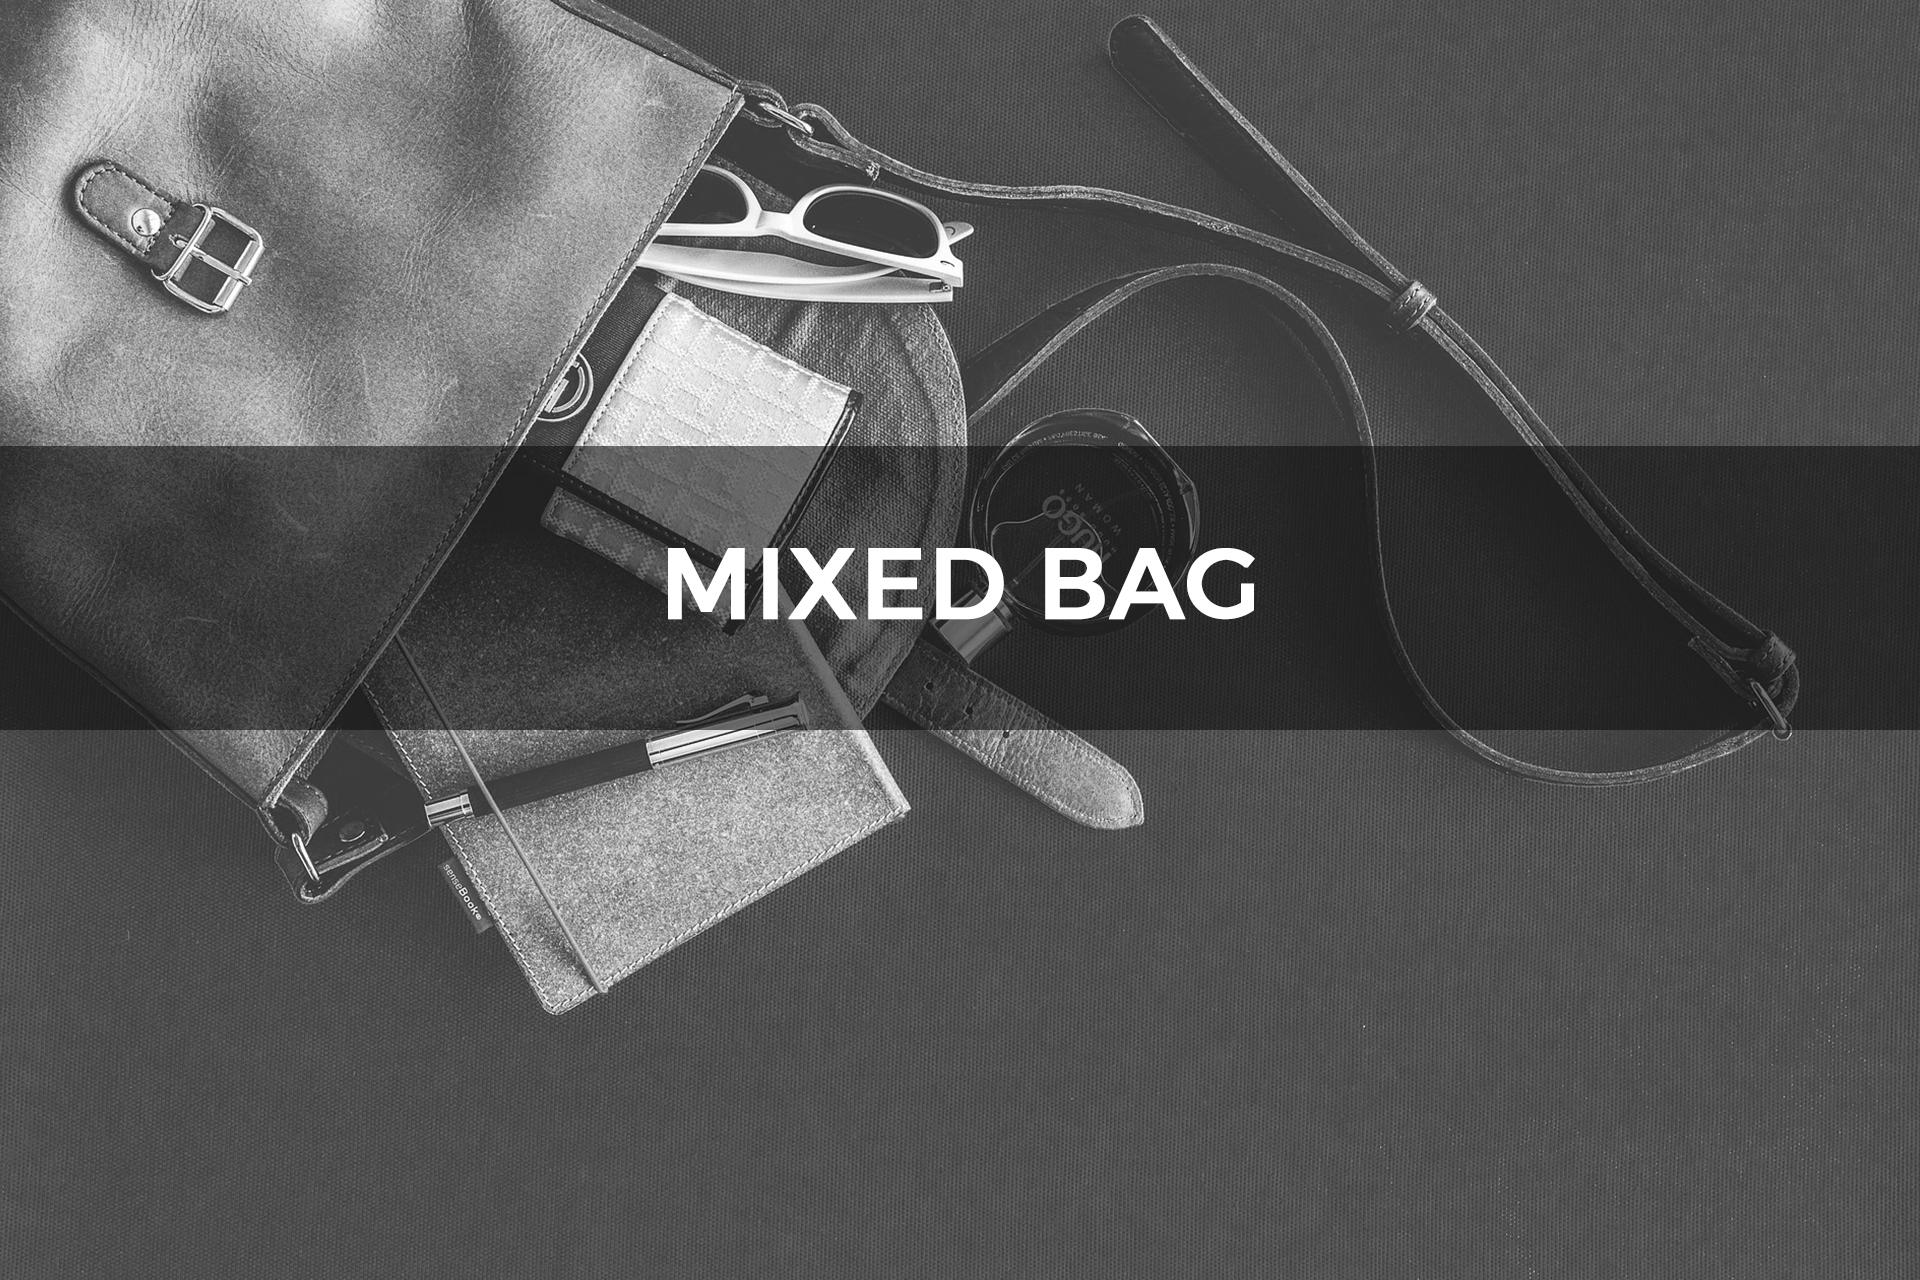 mixedbag_bg.jpg